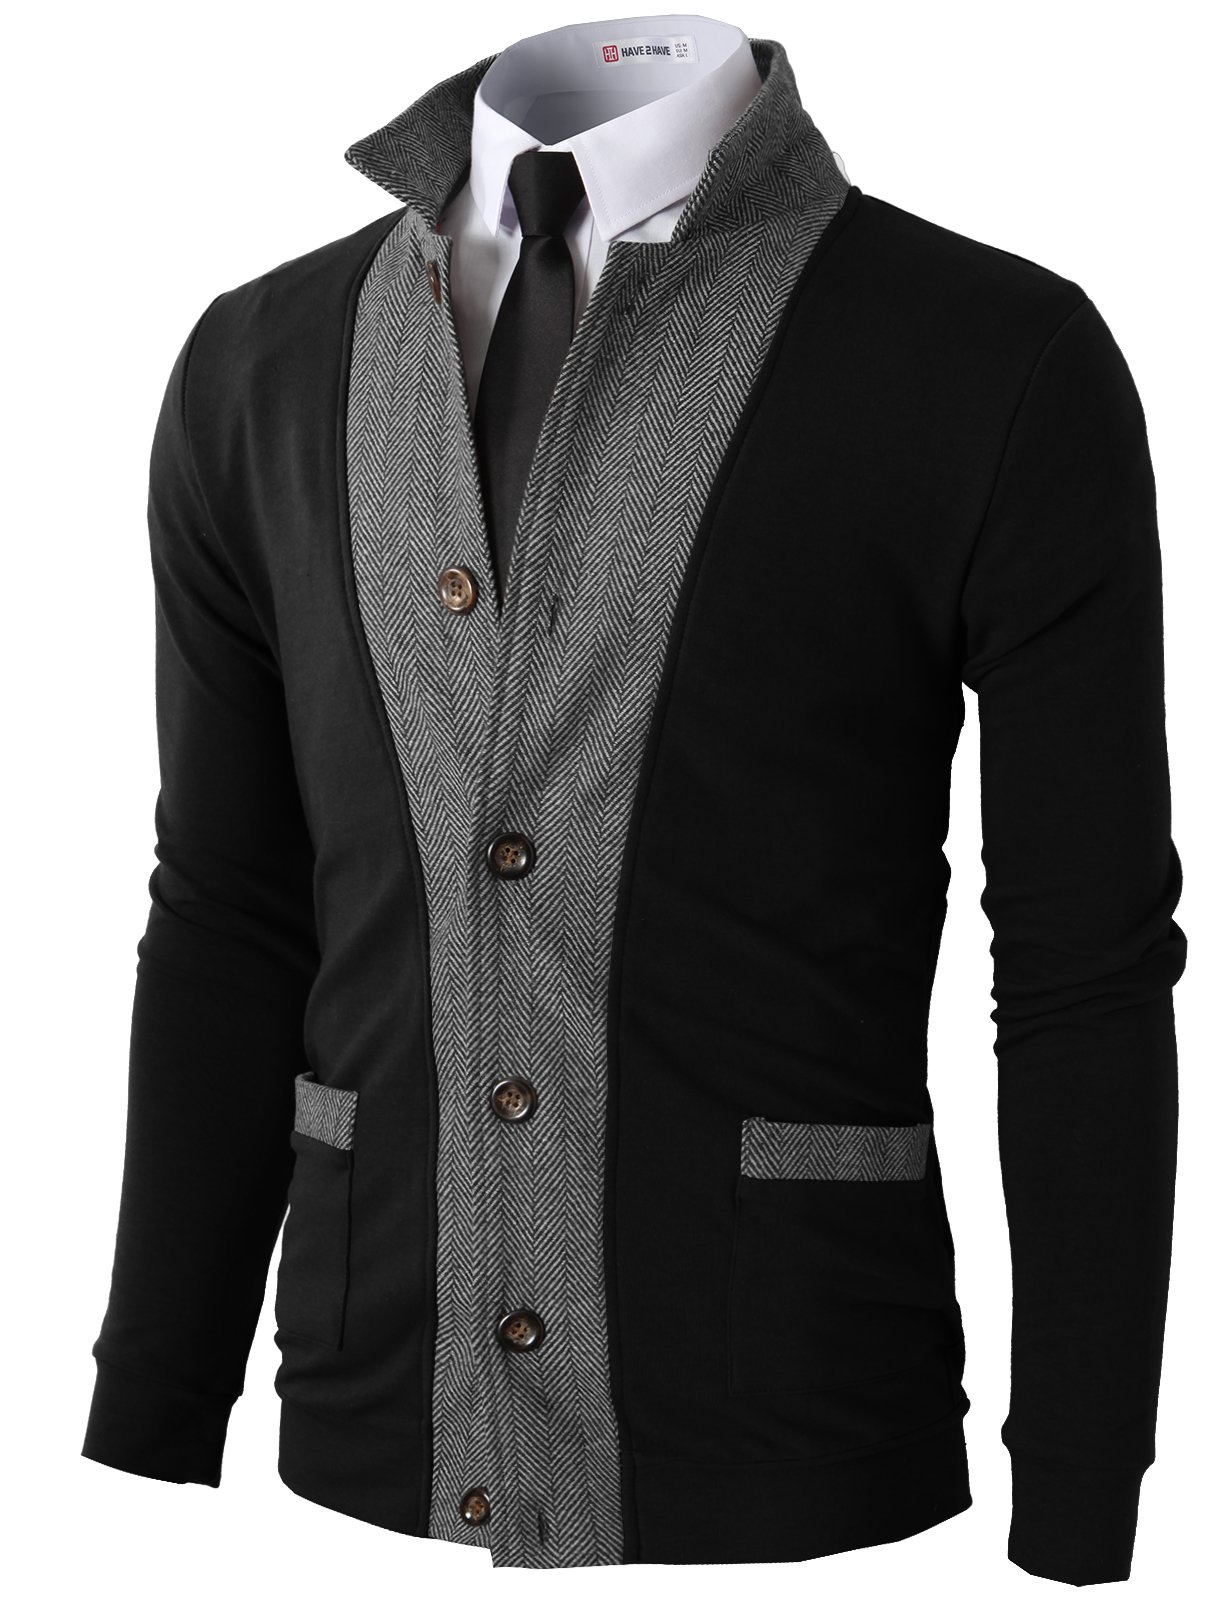 H2H Mens Two-tone Herringbone Jacket Cardigans BLACK US M/Asia L (JLSK03)